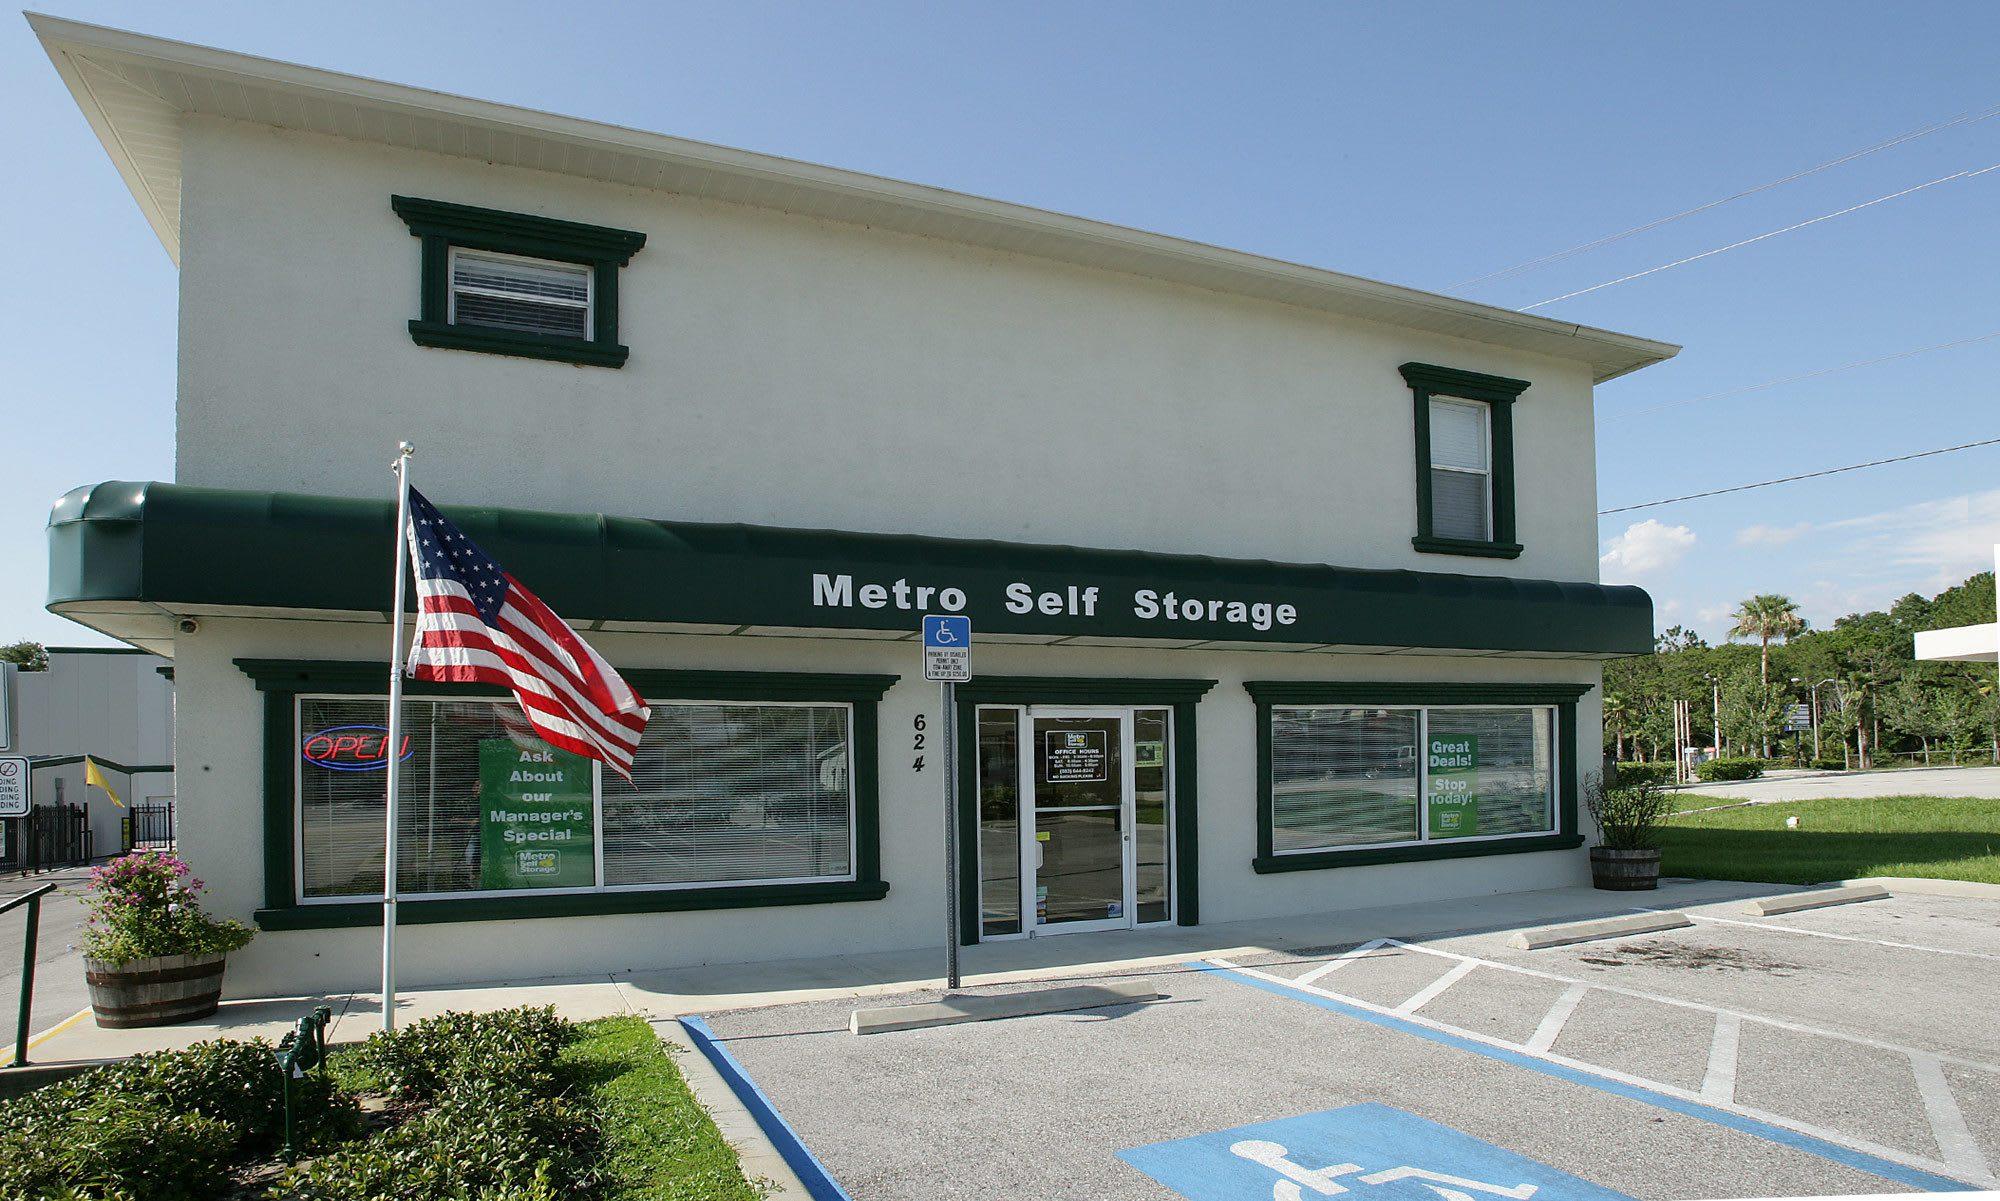 Metro Self Storage in Lakeland, FL